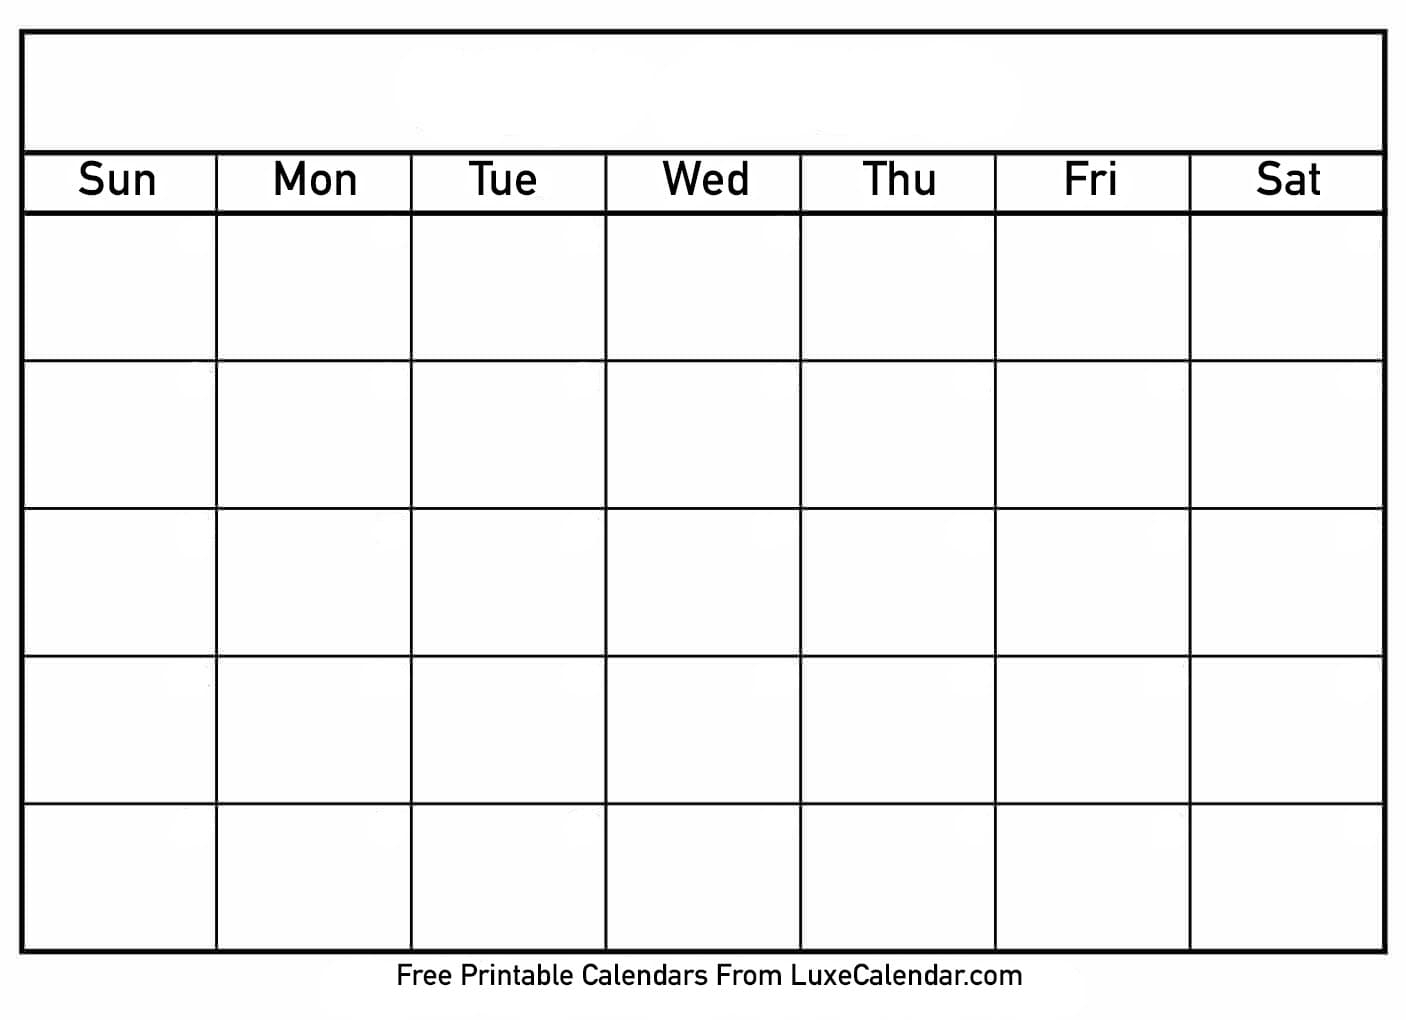 Blank Printable Calendar - Luxe Calendar within Blank Fill In Calendar